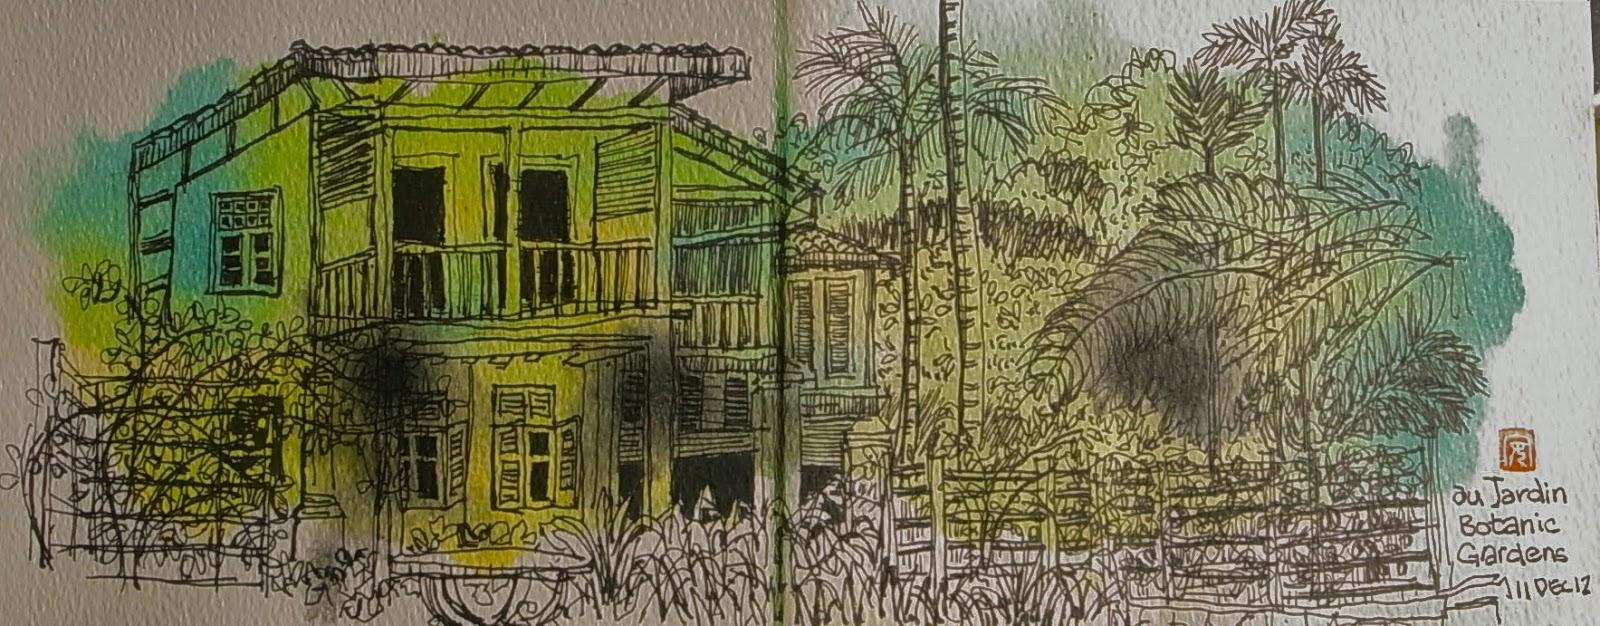 Urban sketchers singapore botanic gardens adhoc sketch for Au jardin les amis singapore botanic gardens